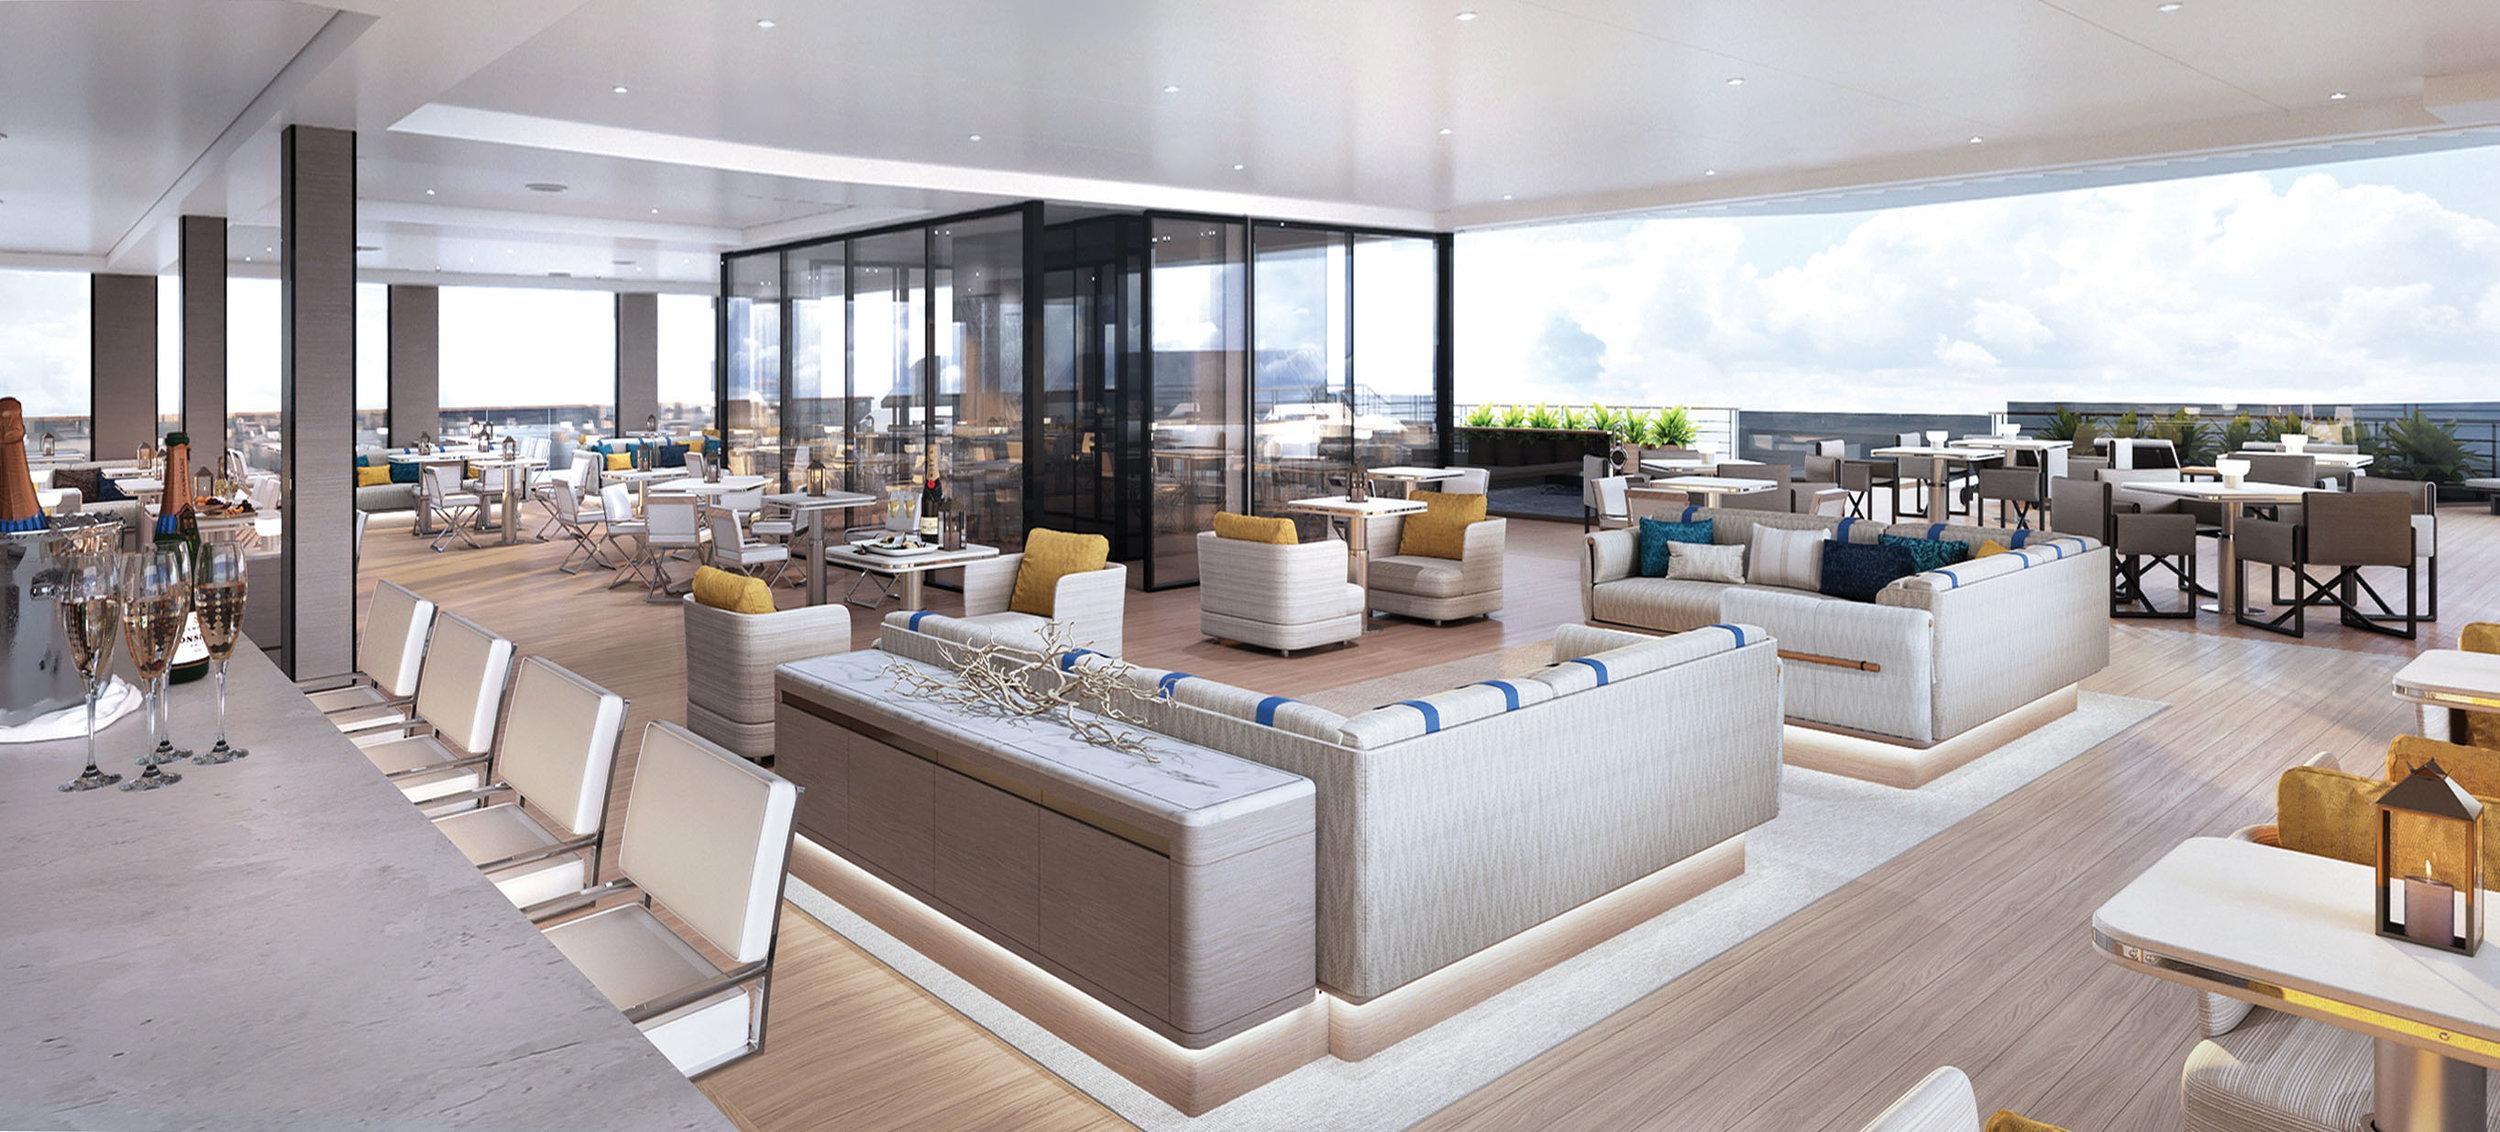 Marina Lounge.jpg